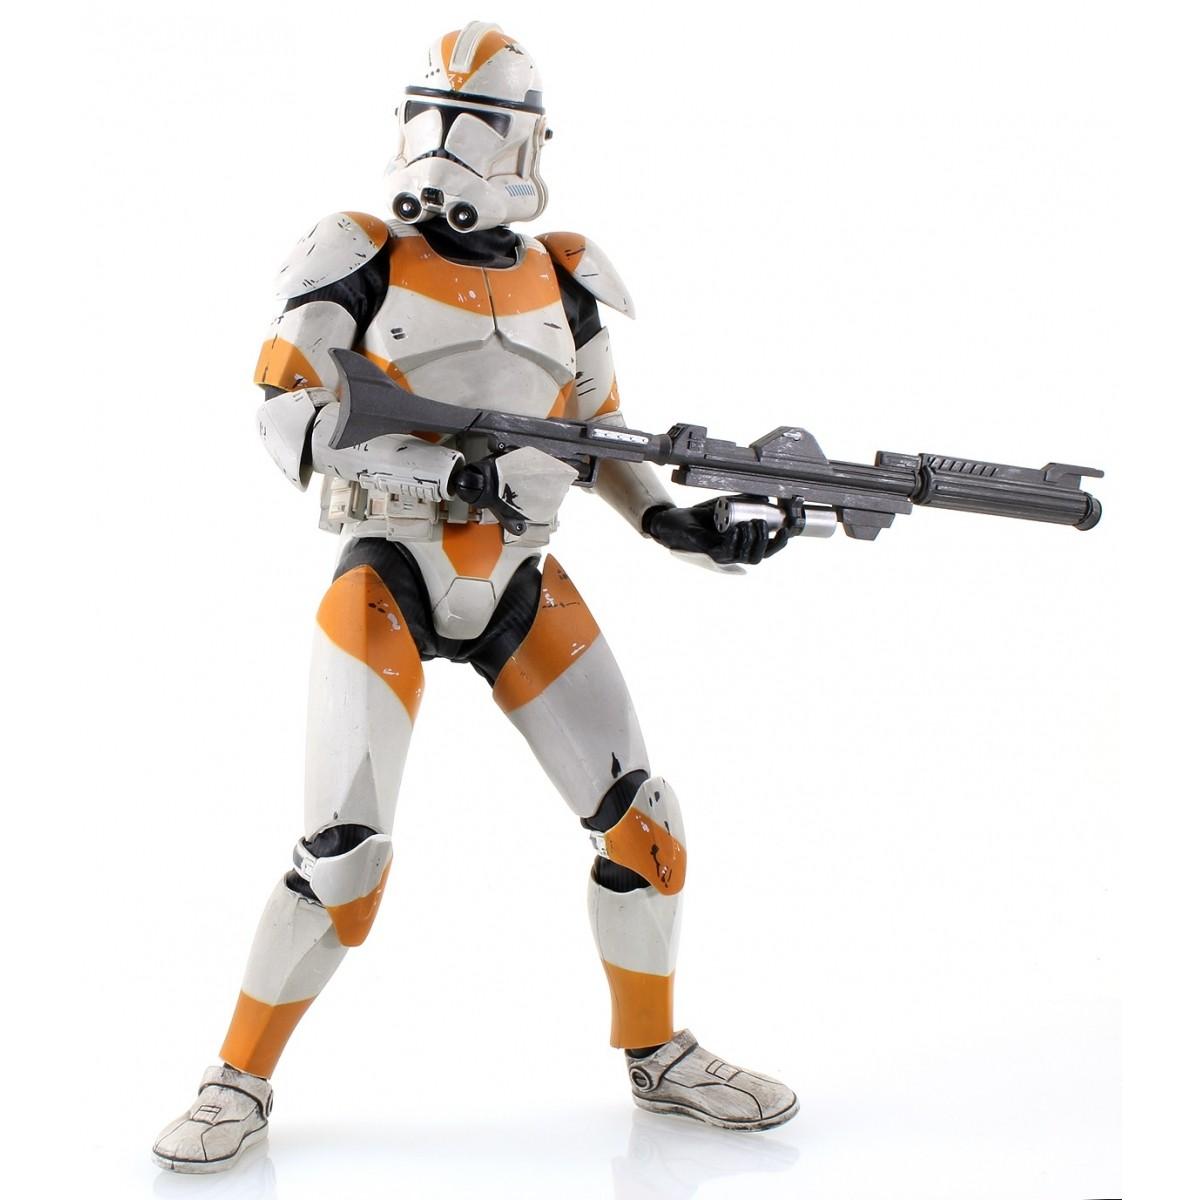 Boneco Clone Trooper: Star Wars Attack Battalion: Utapau Escala 1/6 - Sideshow - CG (SEM CAIXA)